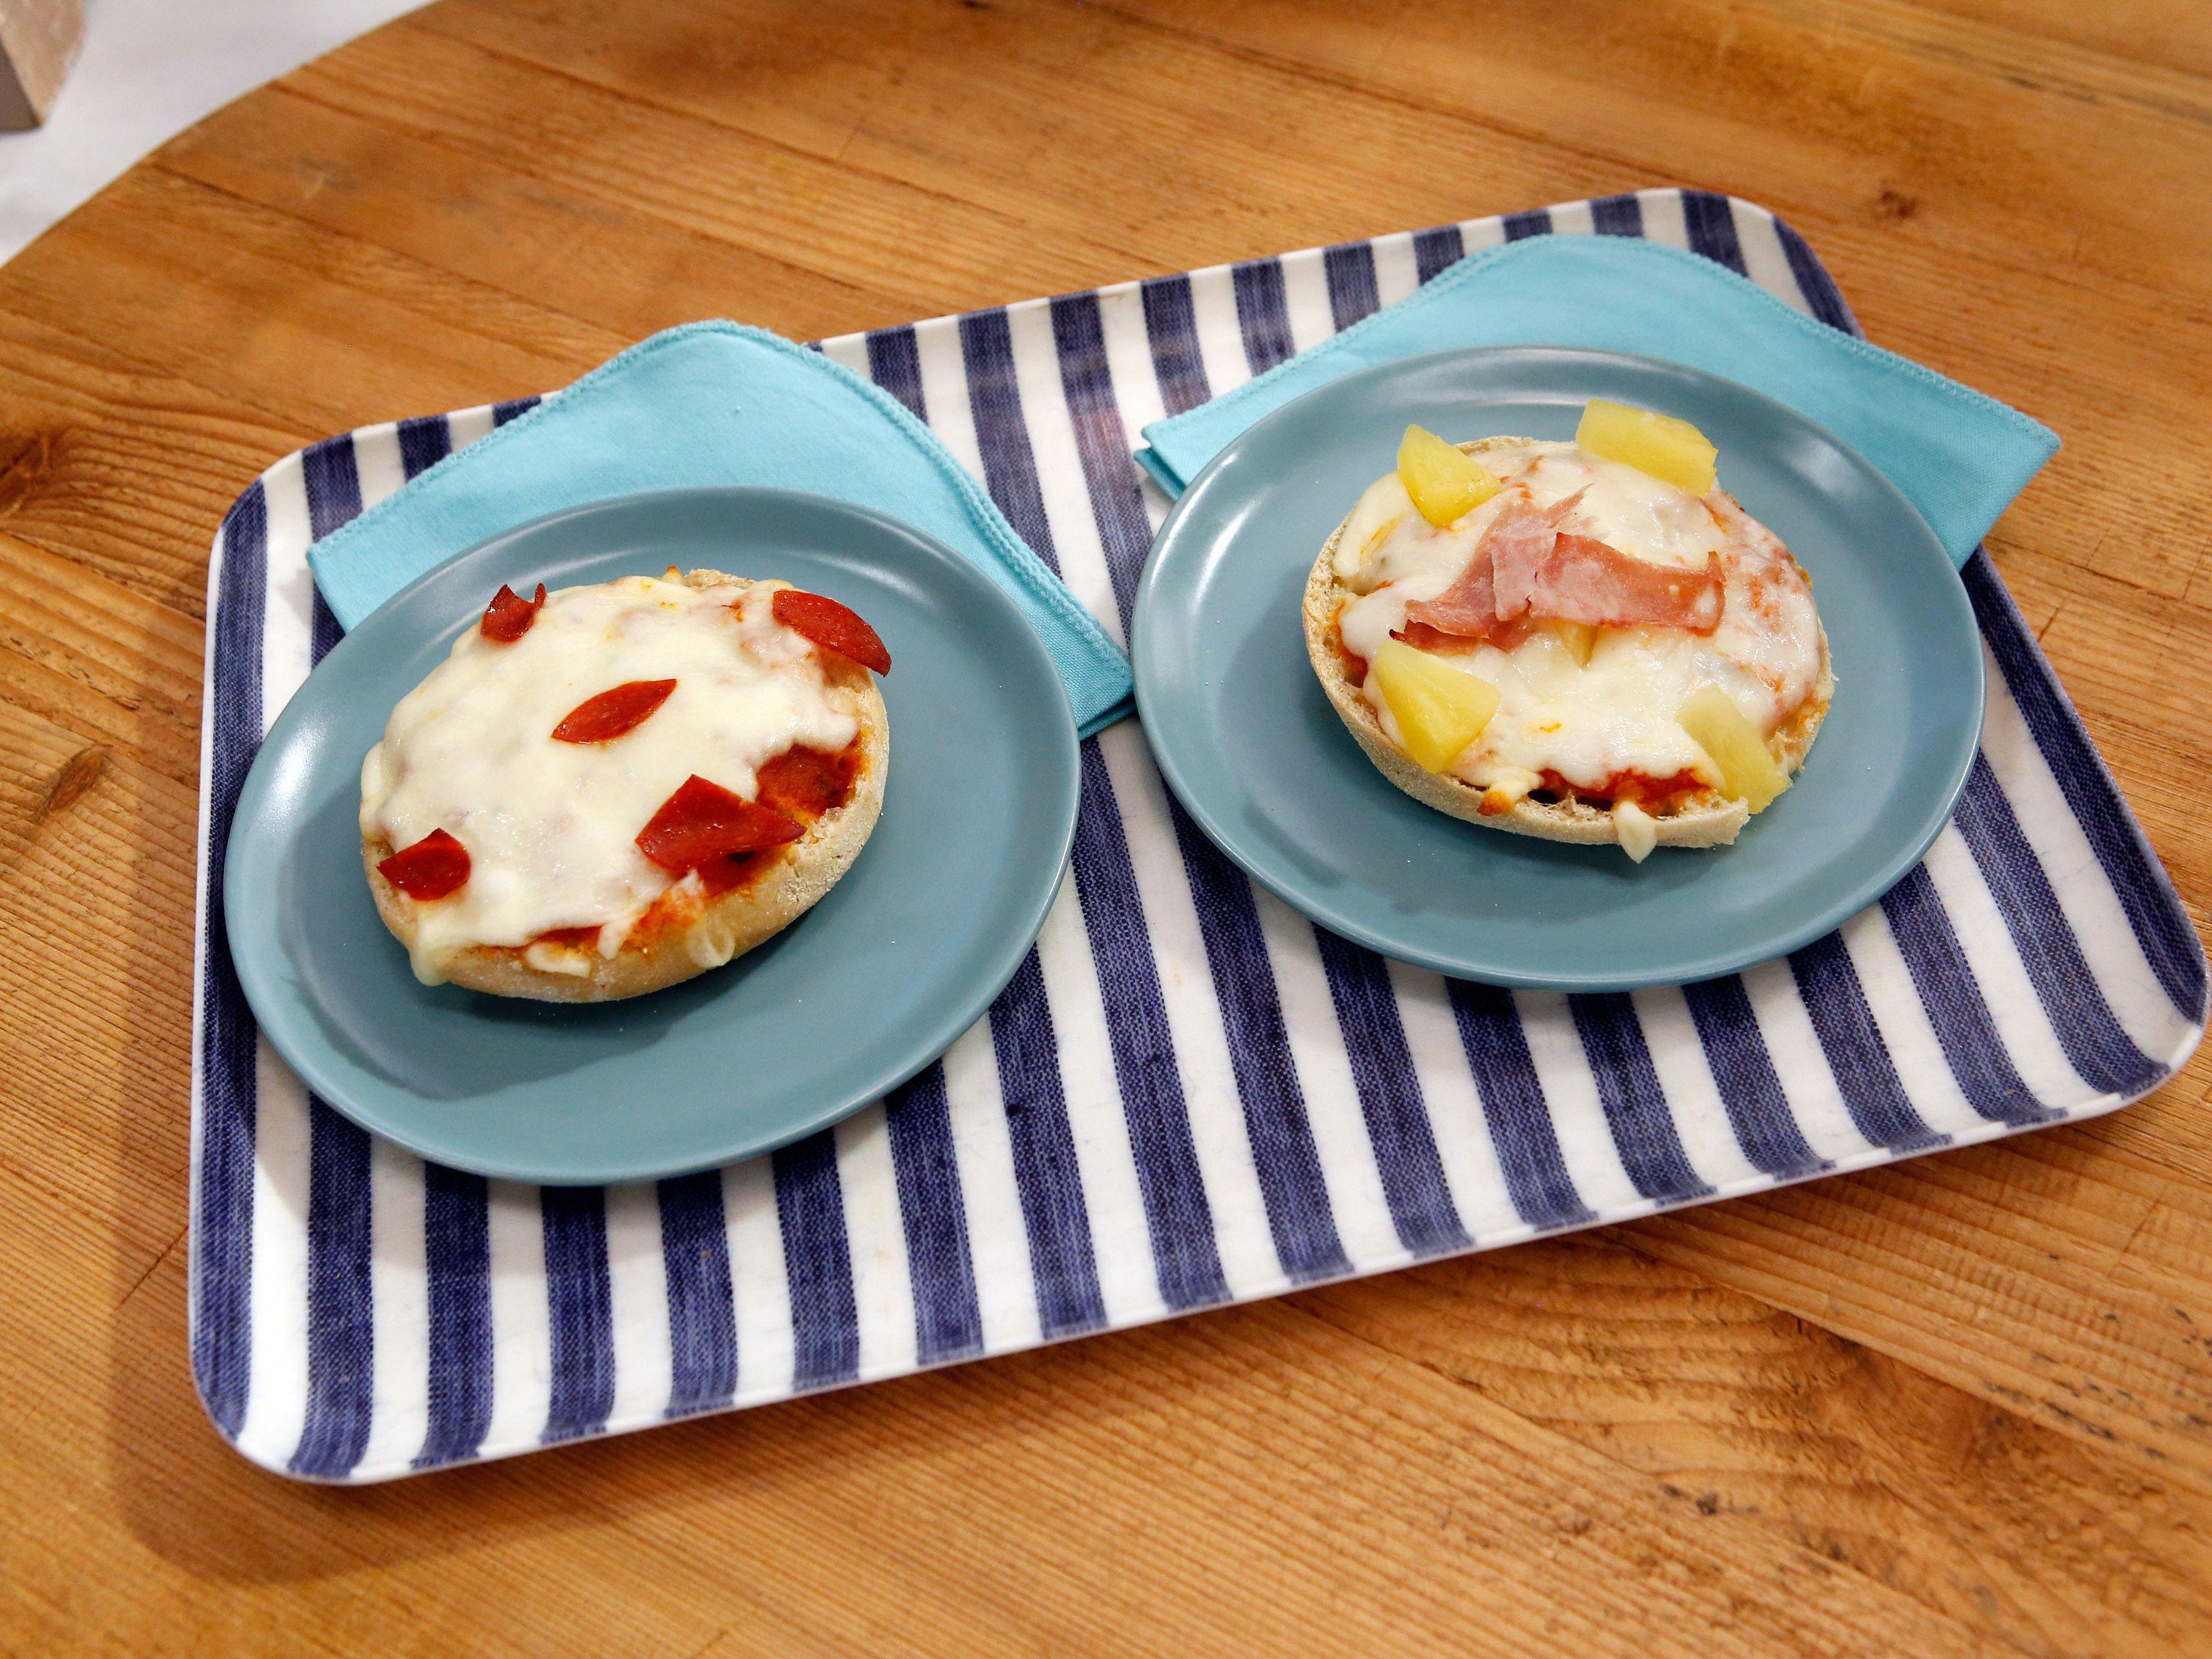 Sunnys easy freeze and bake 247 mini pizzas recipe mini kitchen recipes forumfinder Choice Image